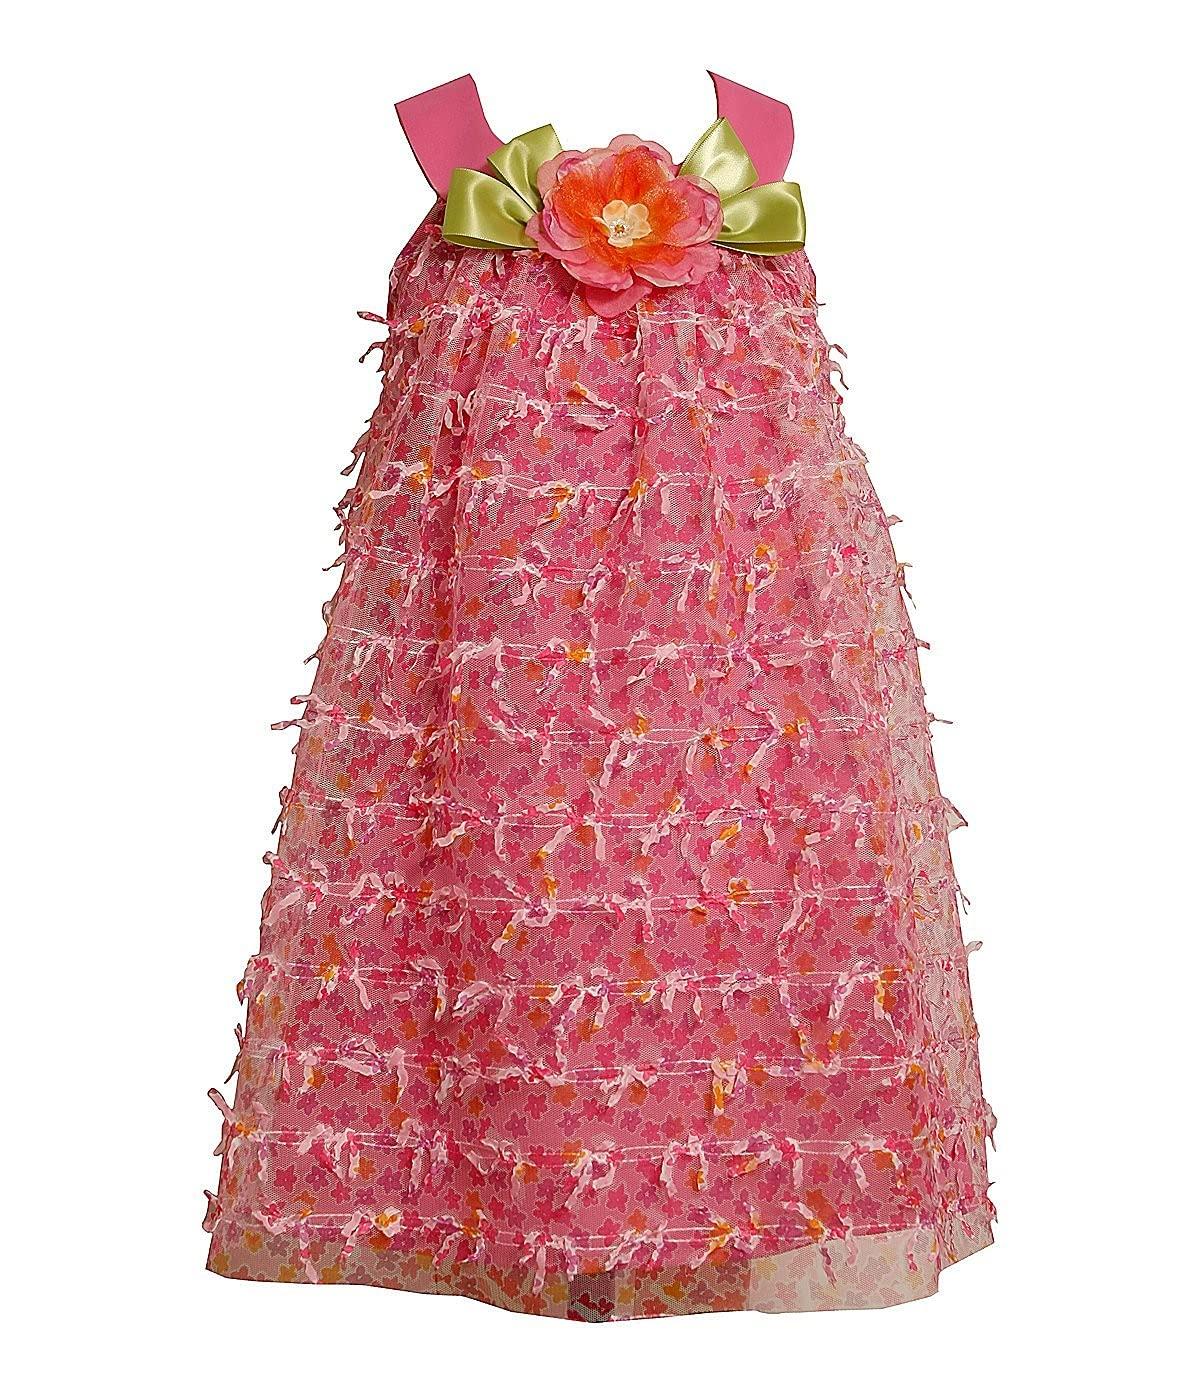 Pink Mesh Bow Dress 4T